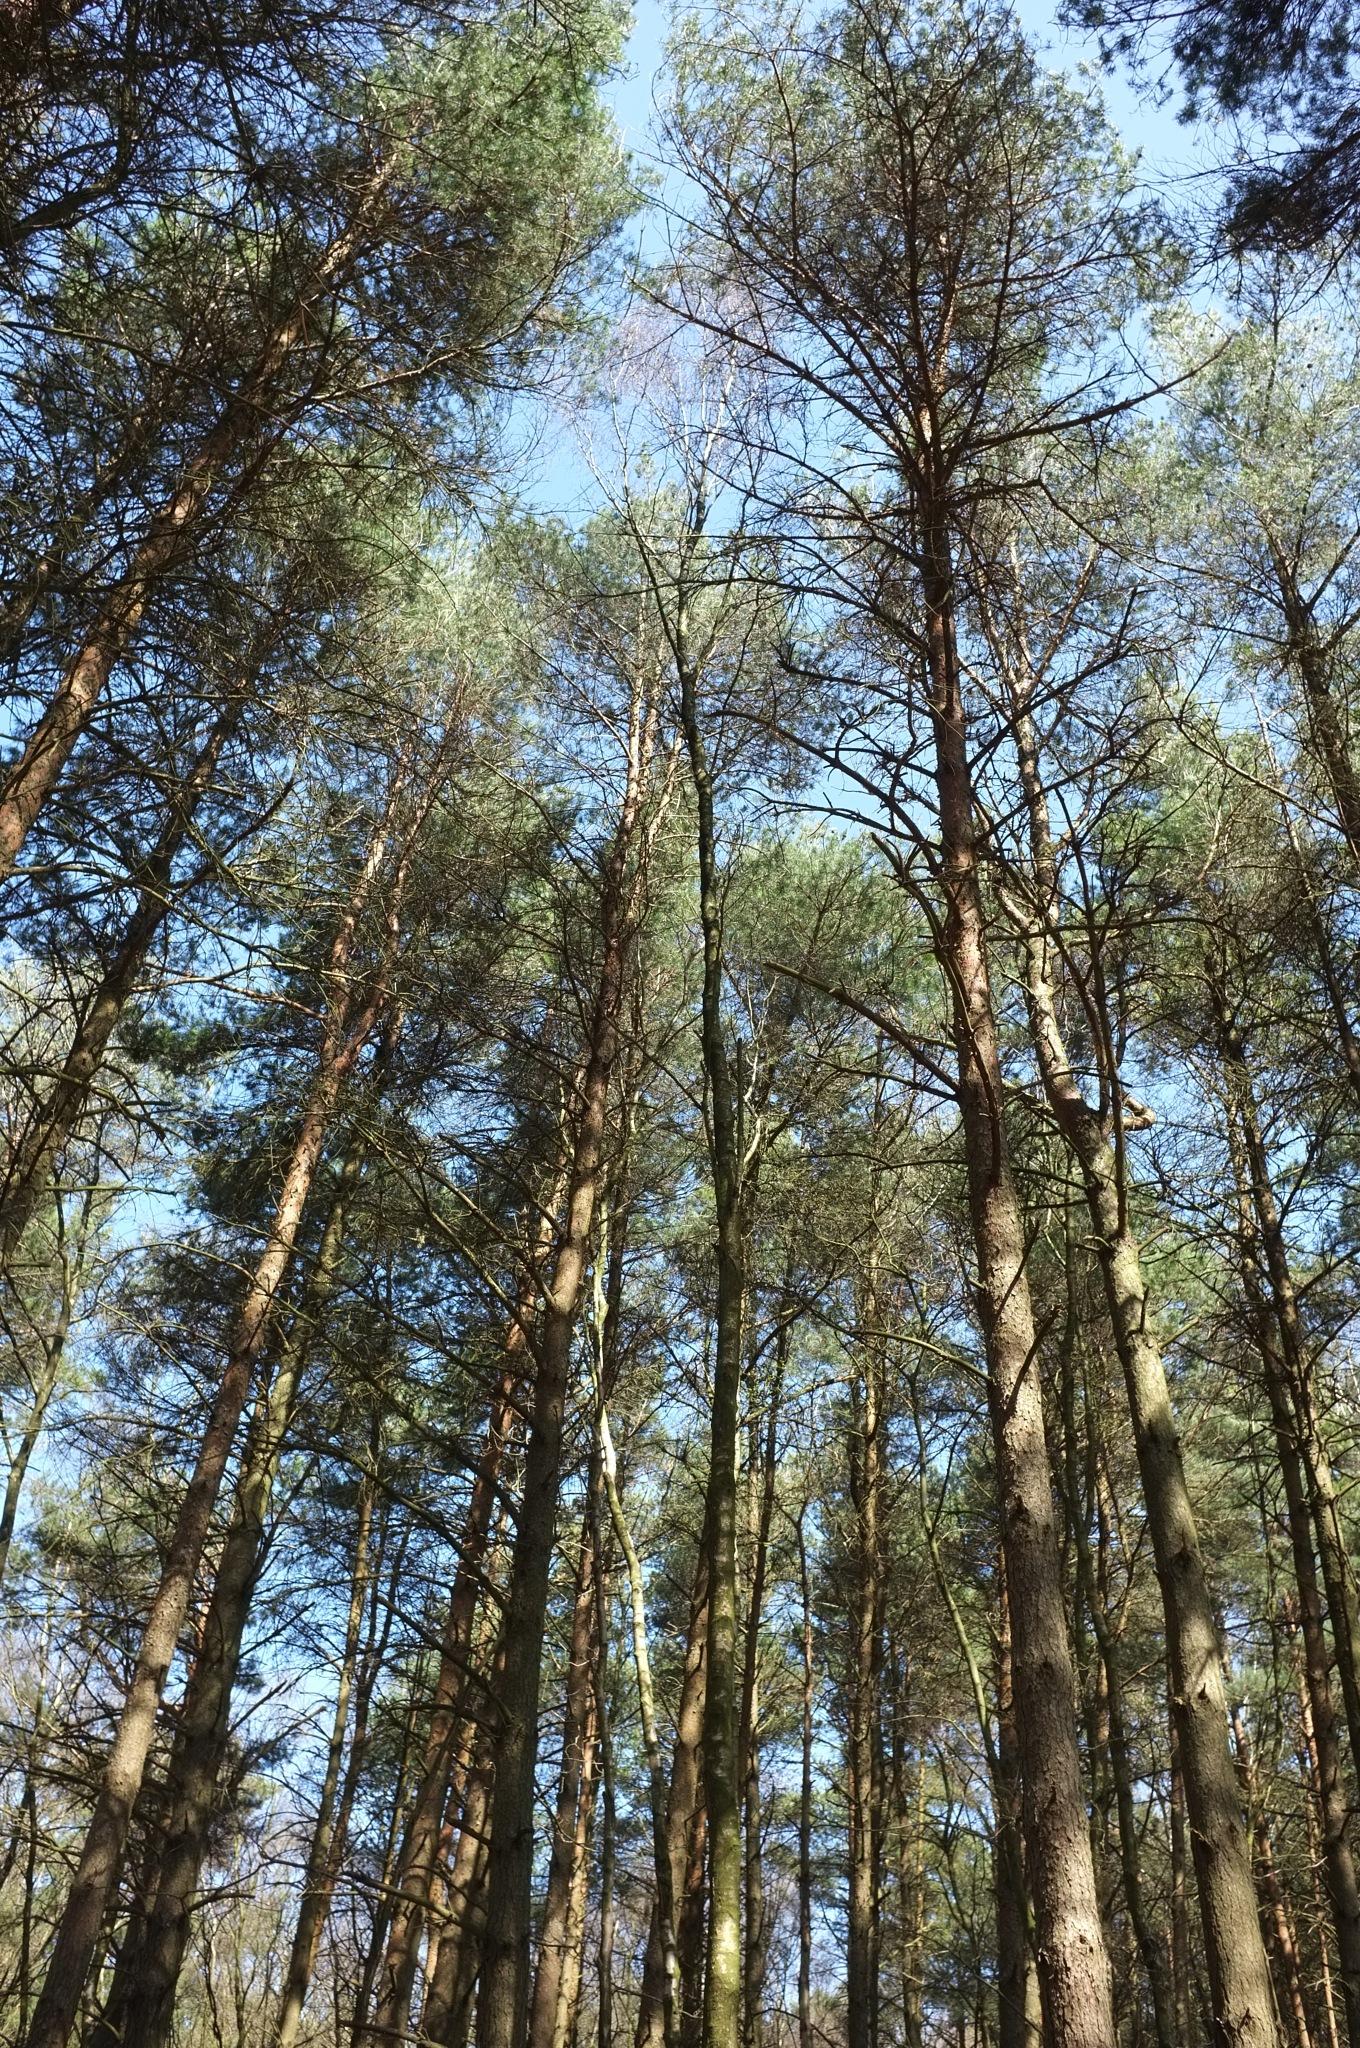 Tree Tops...080601 by Michael jjg